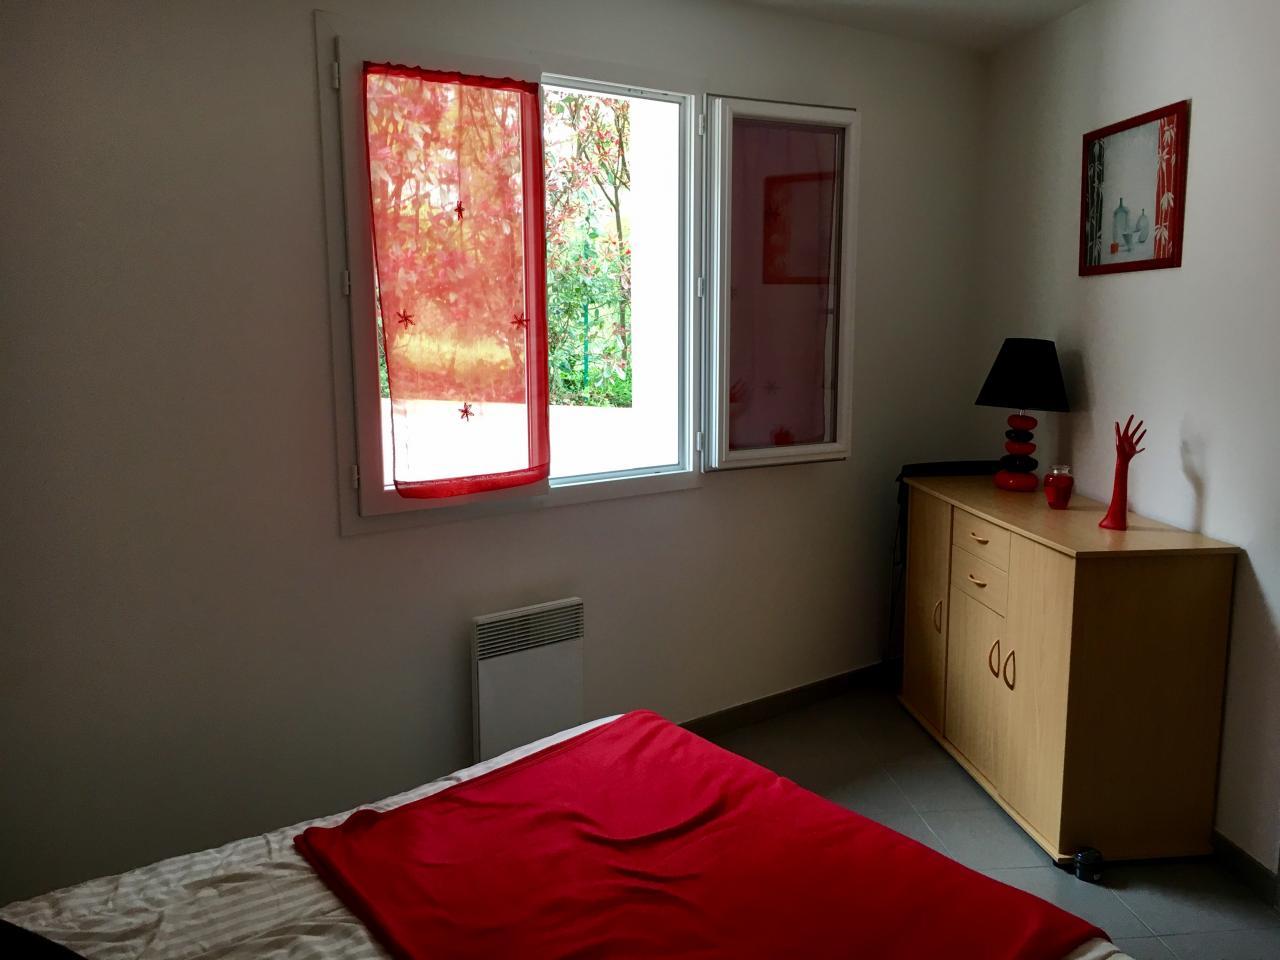 coquette maison basque neuve class e 4 toiles meubl s de tourisme ciboure location pays. Black Bedroom Furniture Sets. Home Design Ideas